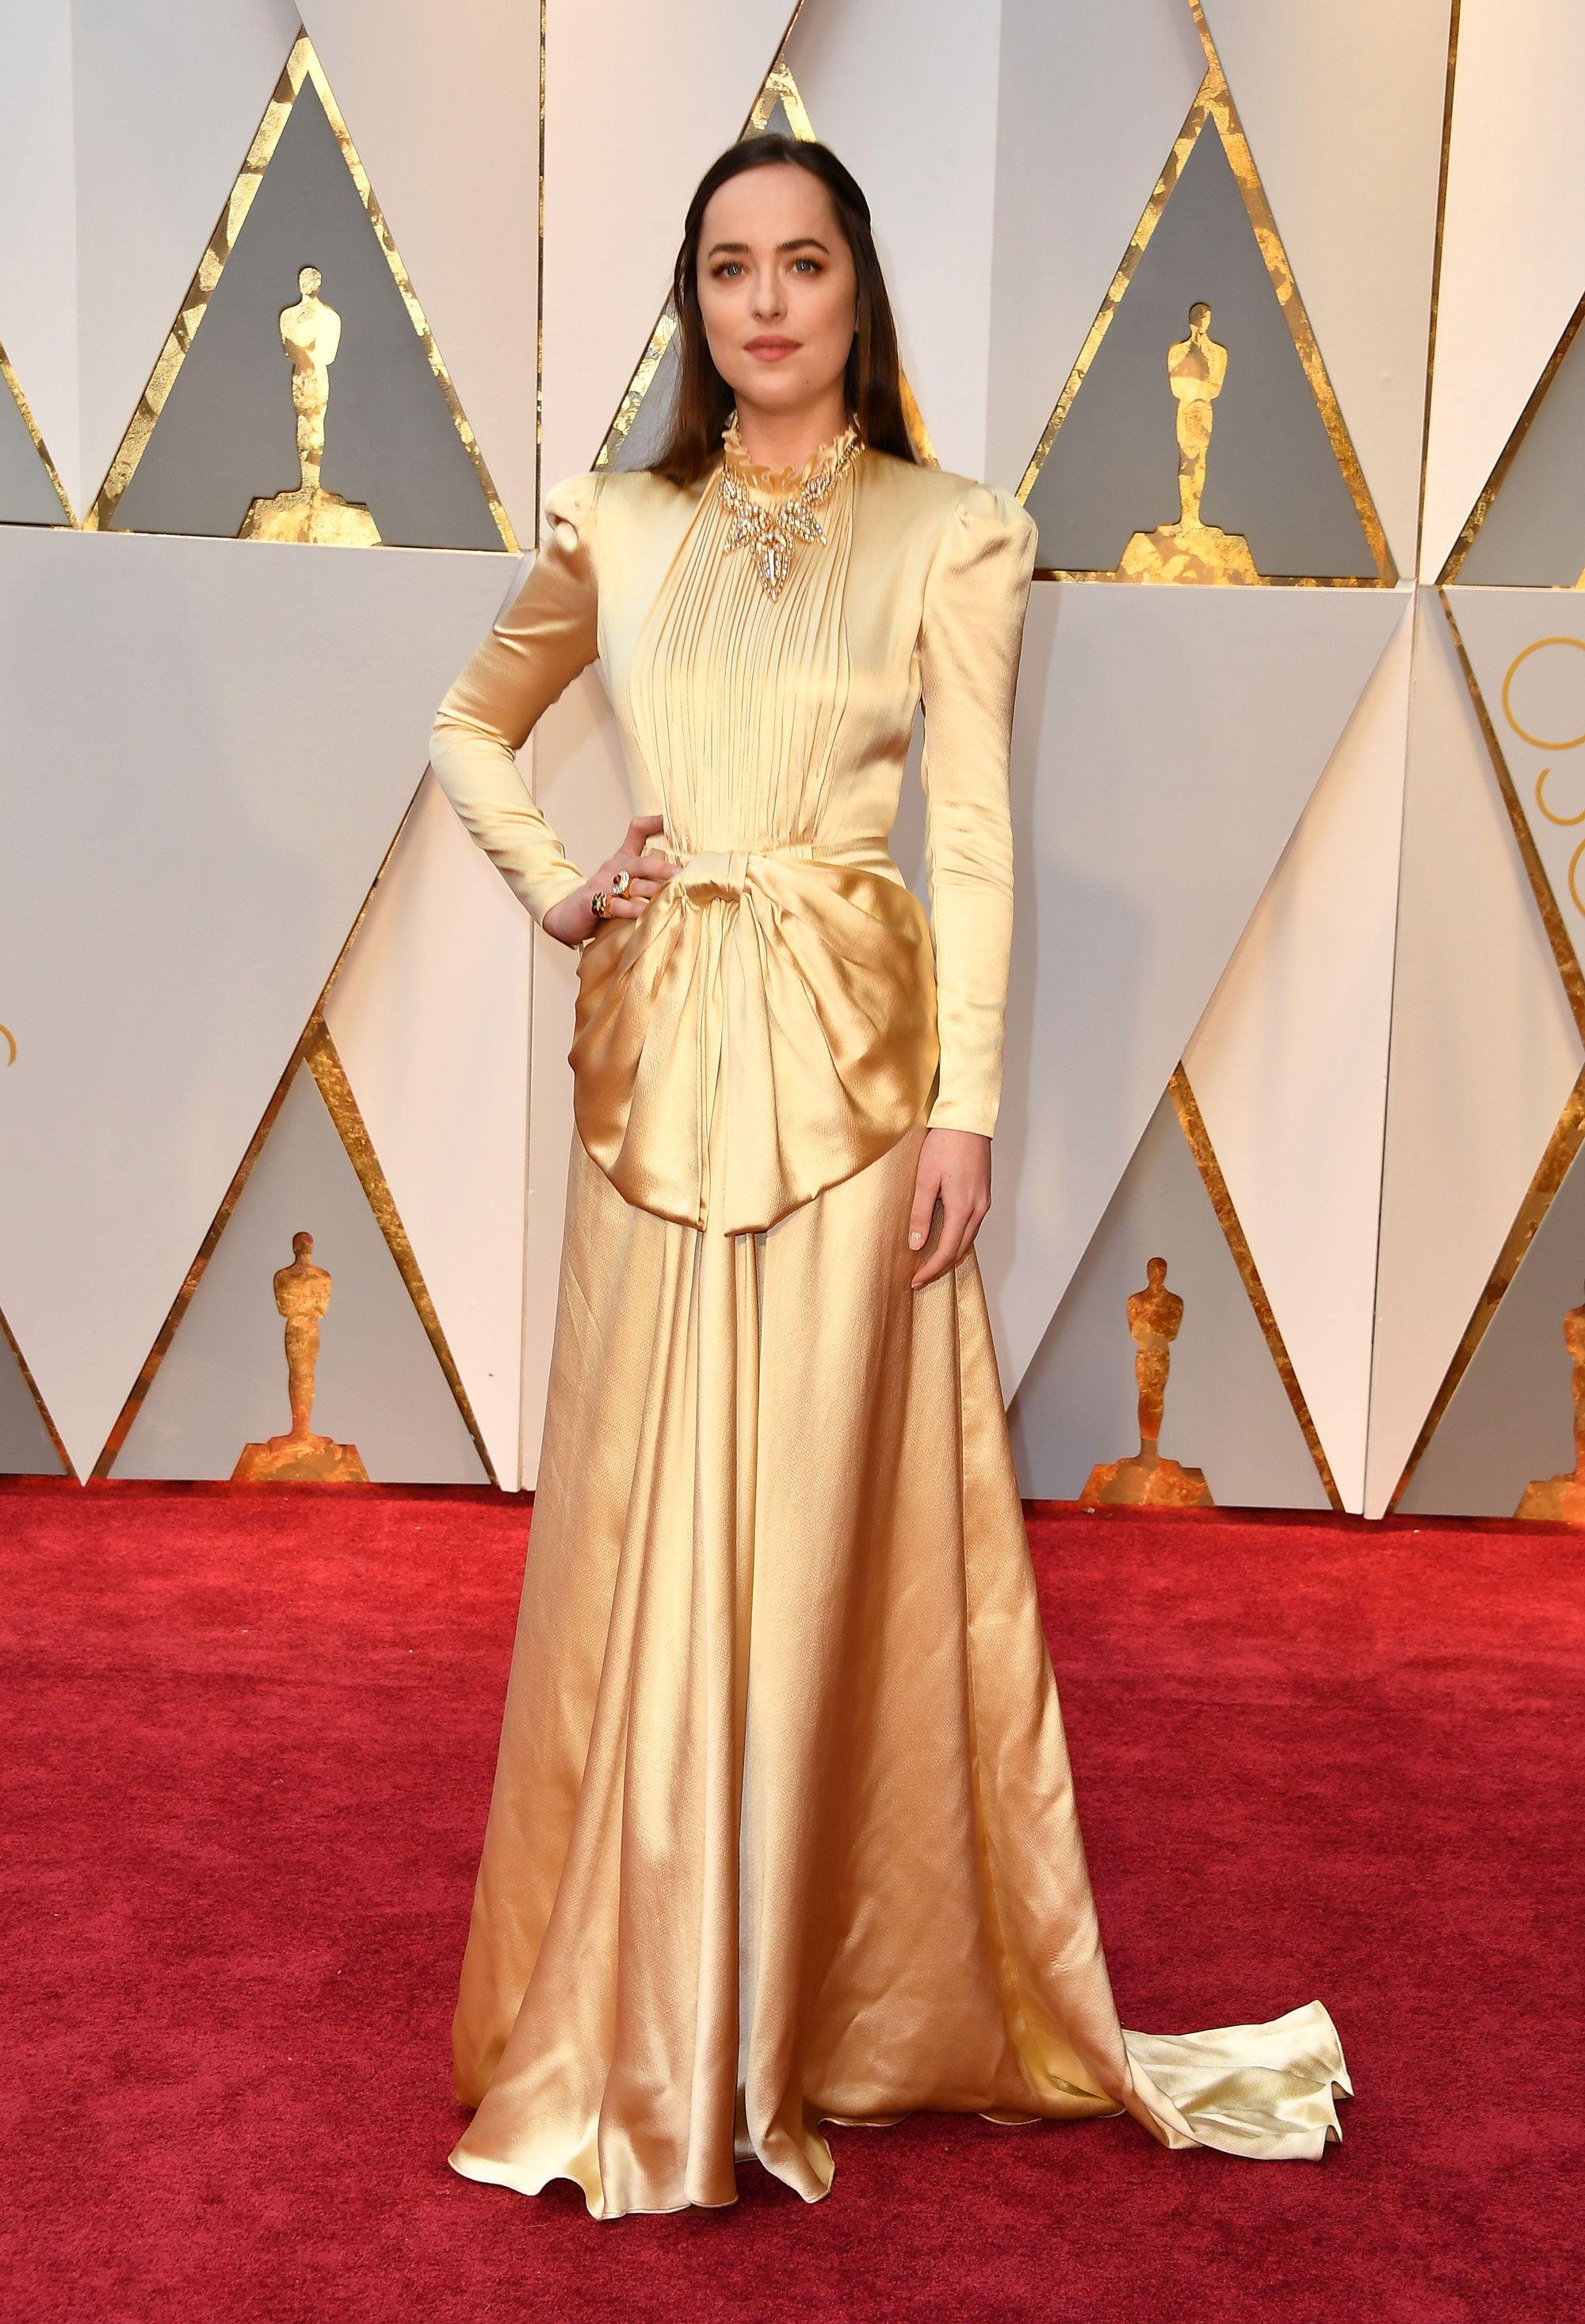 Dakota Johnson Dress on Oscar